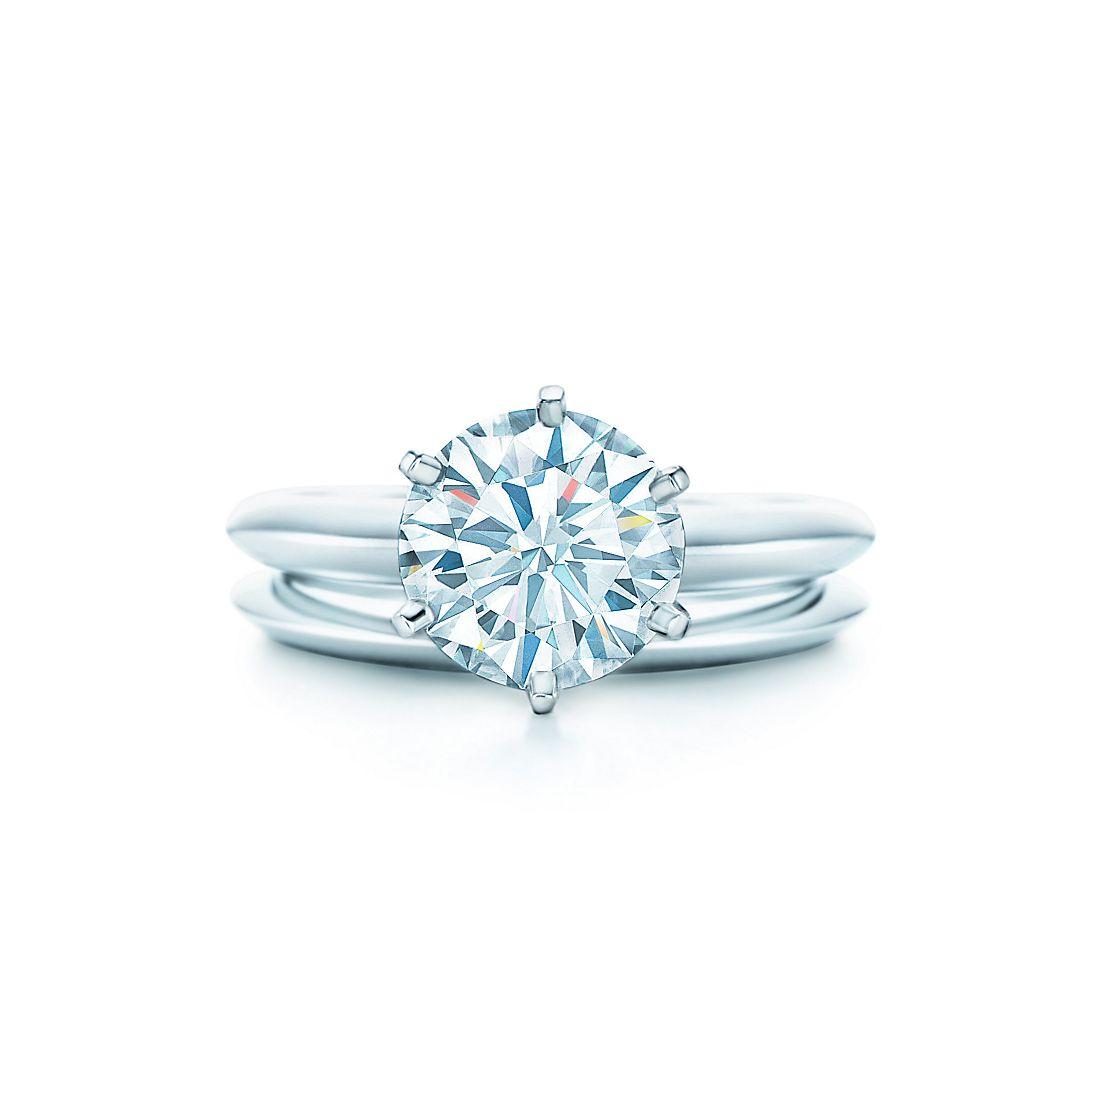 The Tiffany Setting Engagement Rings Tiffany Co